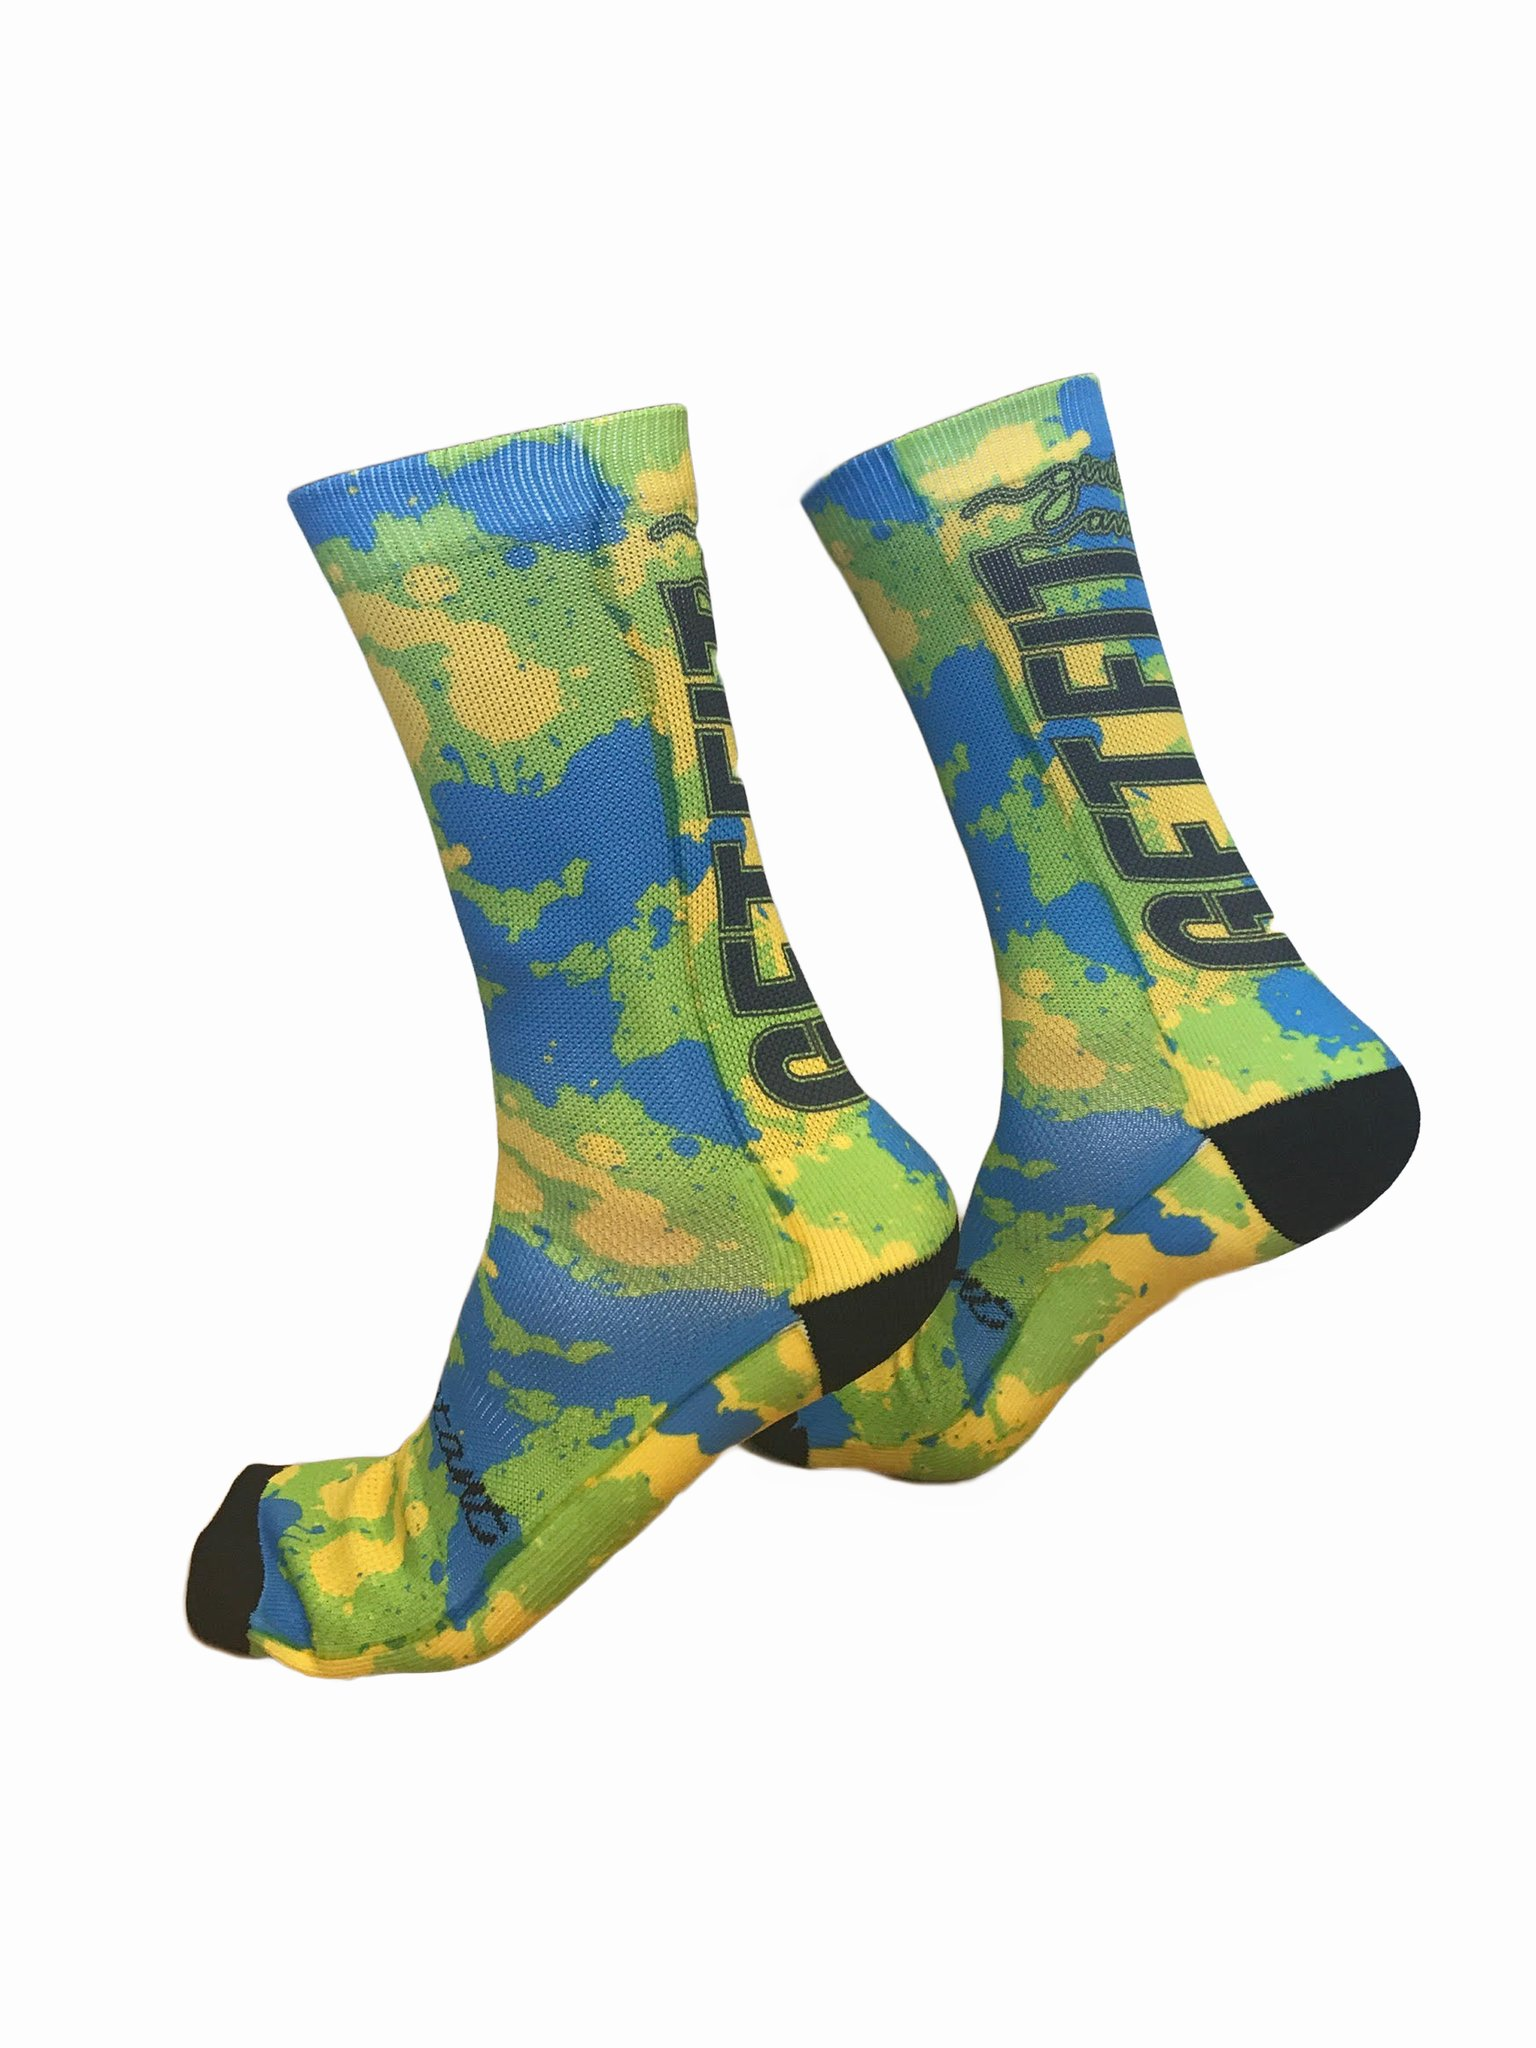 sock6_1024x1024_2x